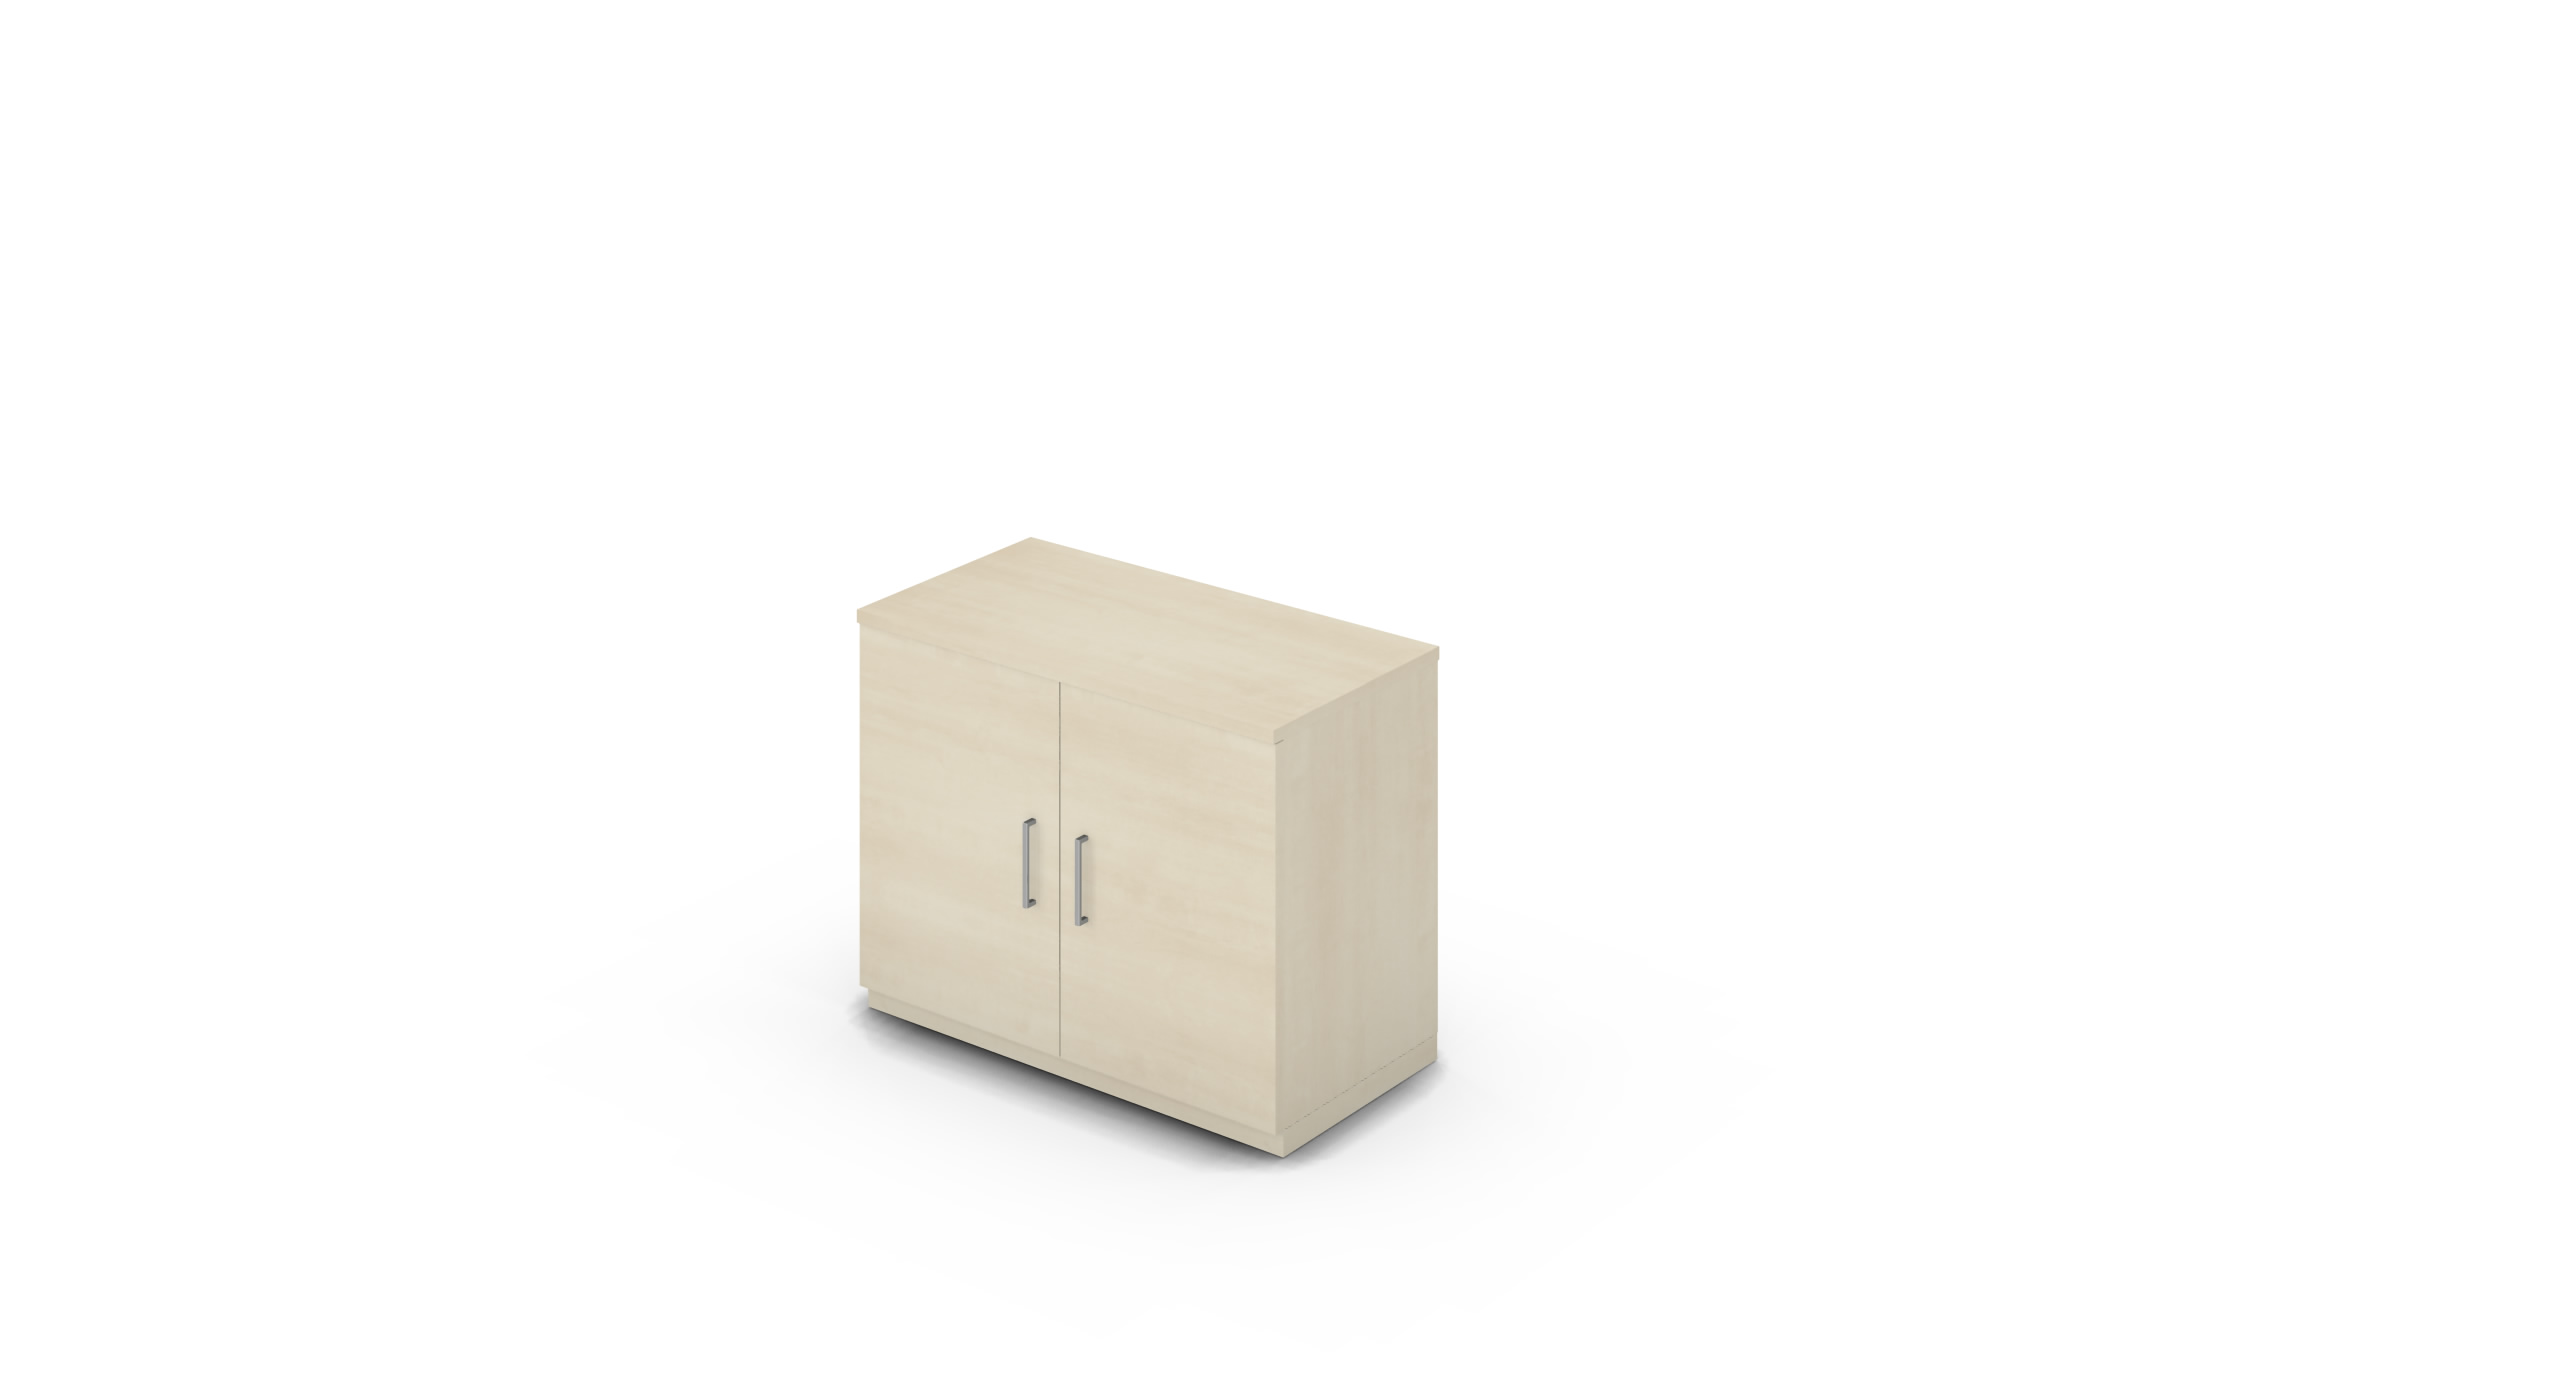 Cabinet_900x450x775_HD_Maple_Bar_Square_NoCylinder